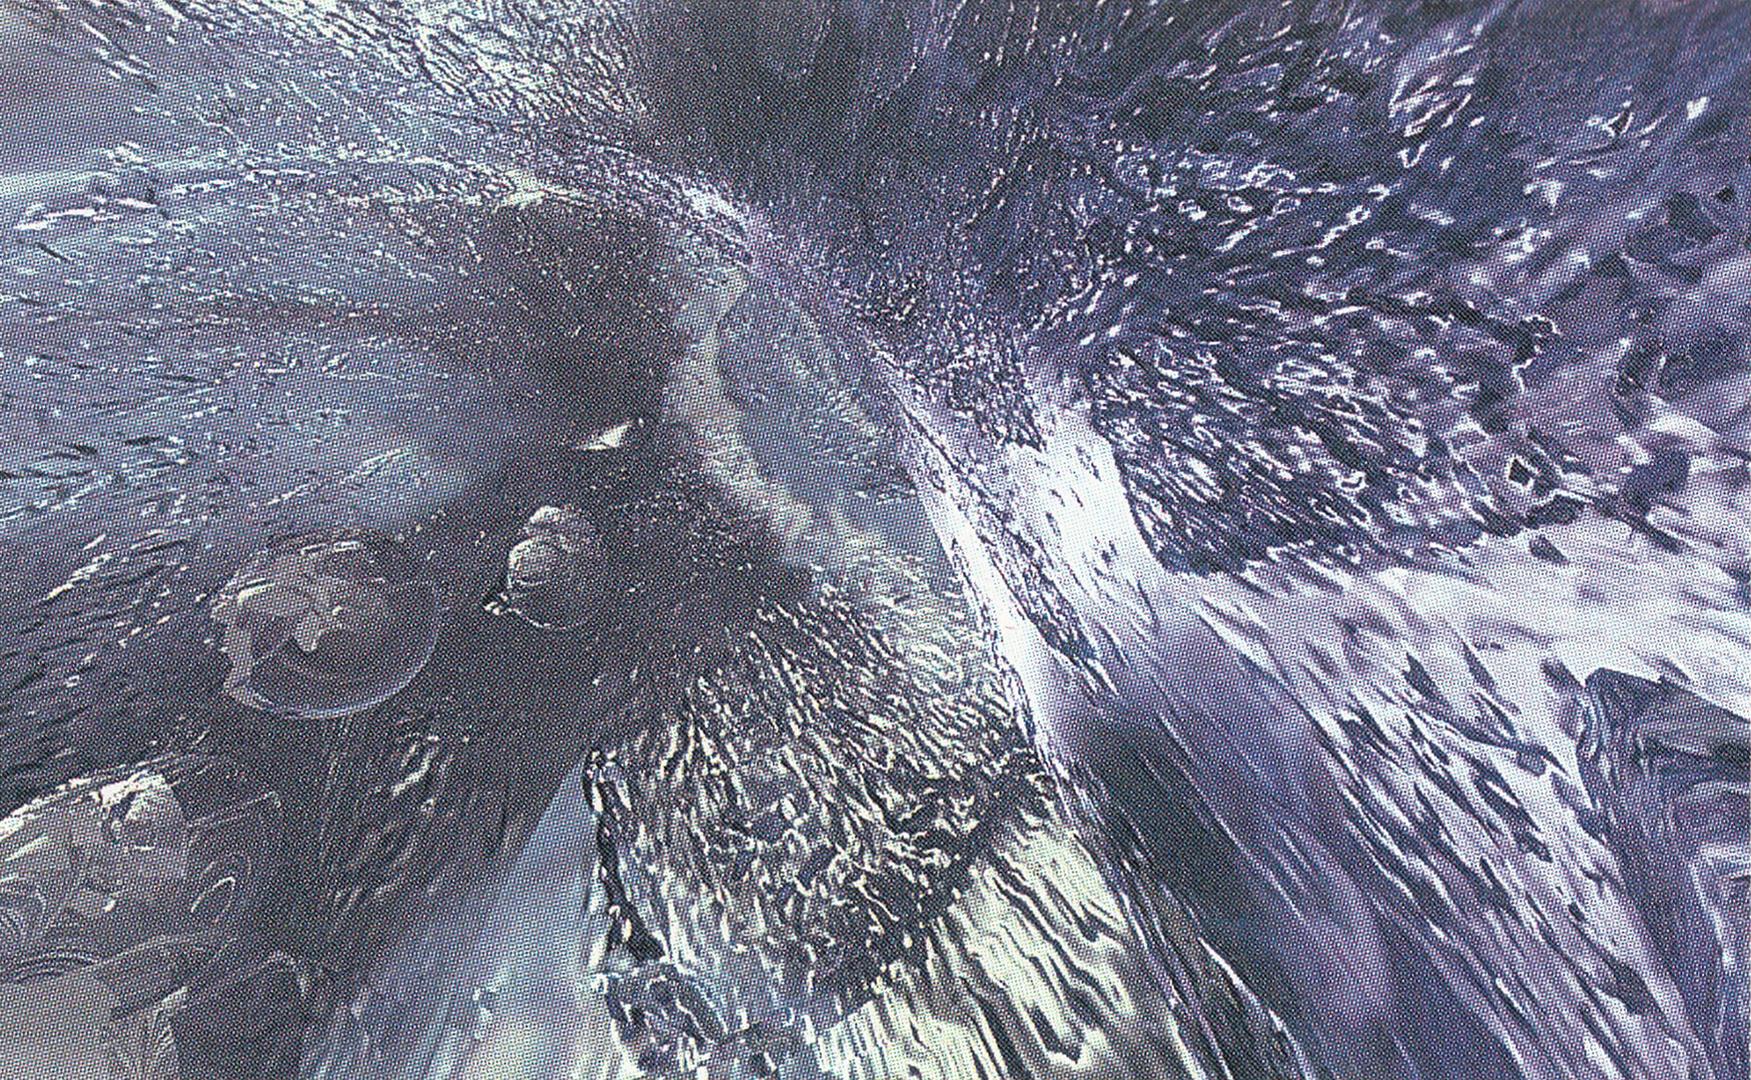 ©1993, Char Davies, Drowning (Rapture)